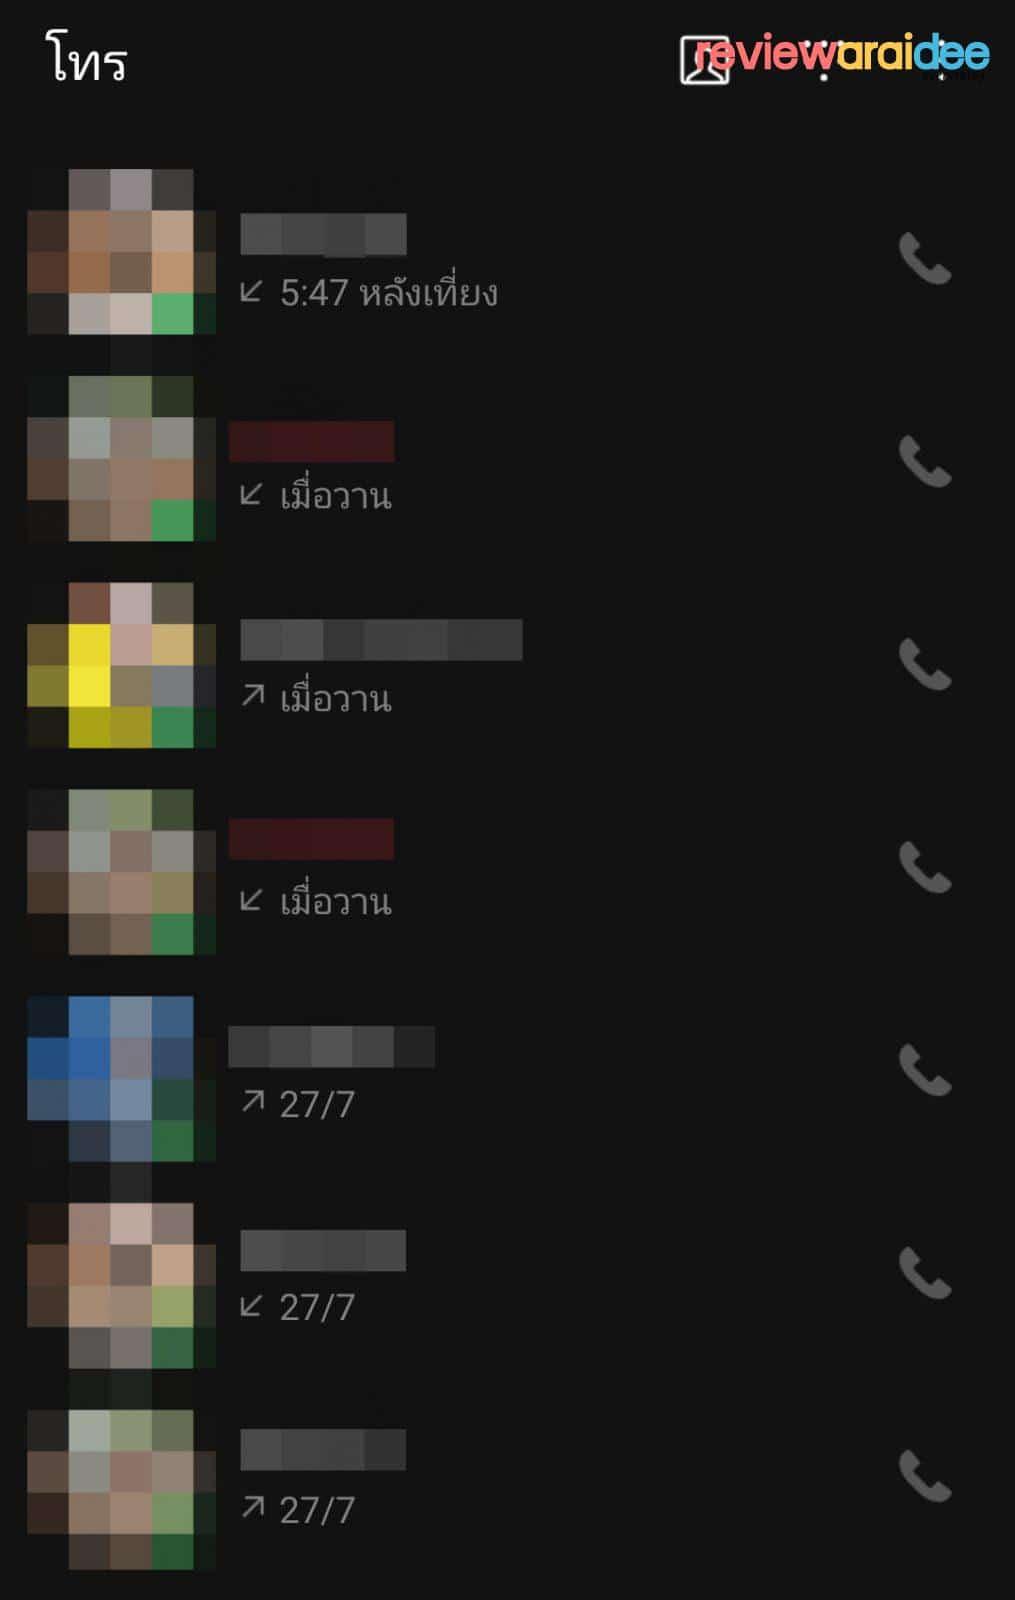 [LINE] ไลน์ เอาท์ (line out) วิธีเช็คข้อมูลโทรย้อนหลังได้ (10.12.1)